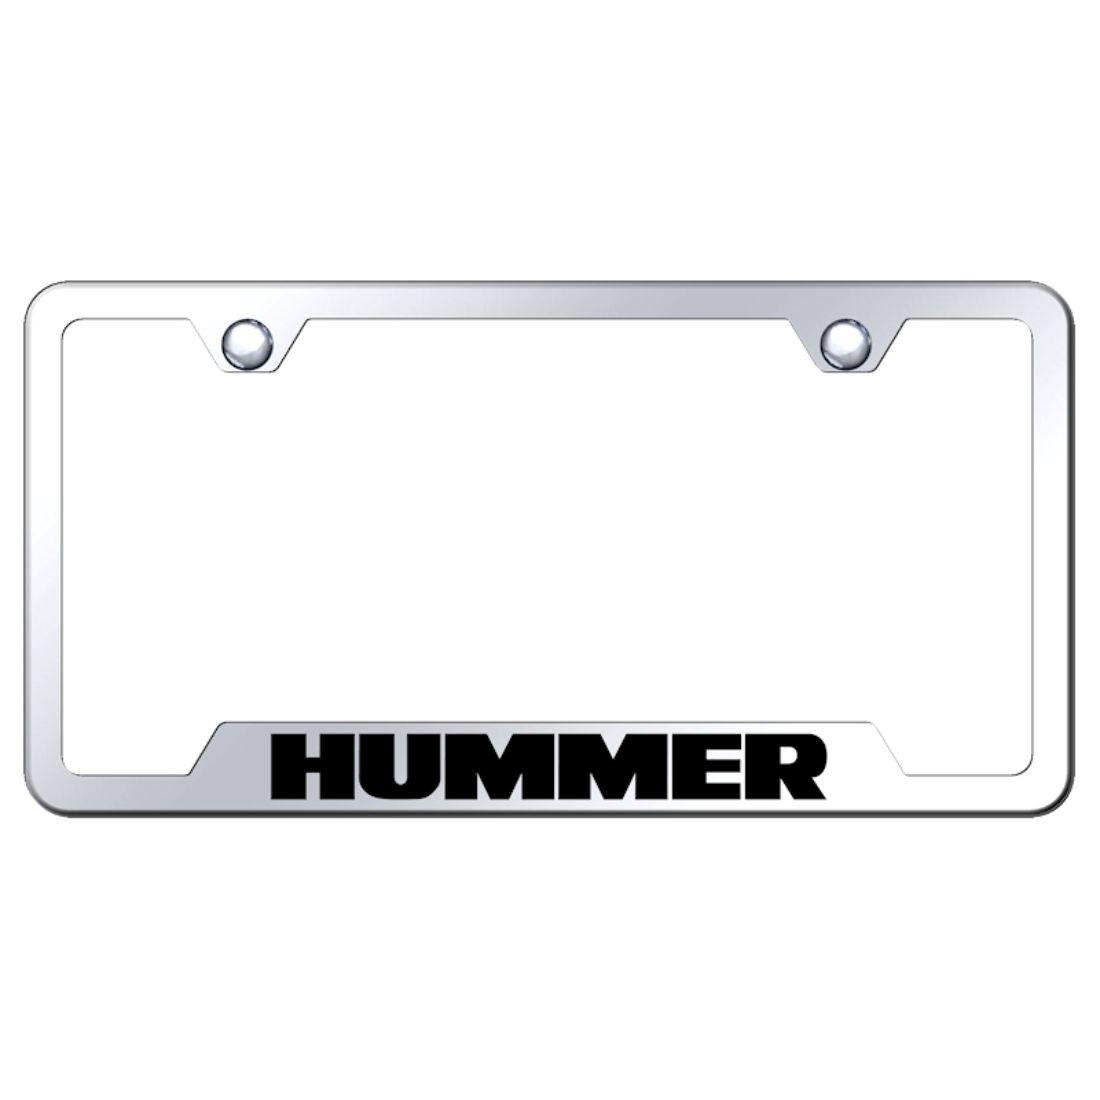 Hummer Black and Chrome License Plate